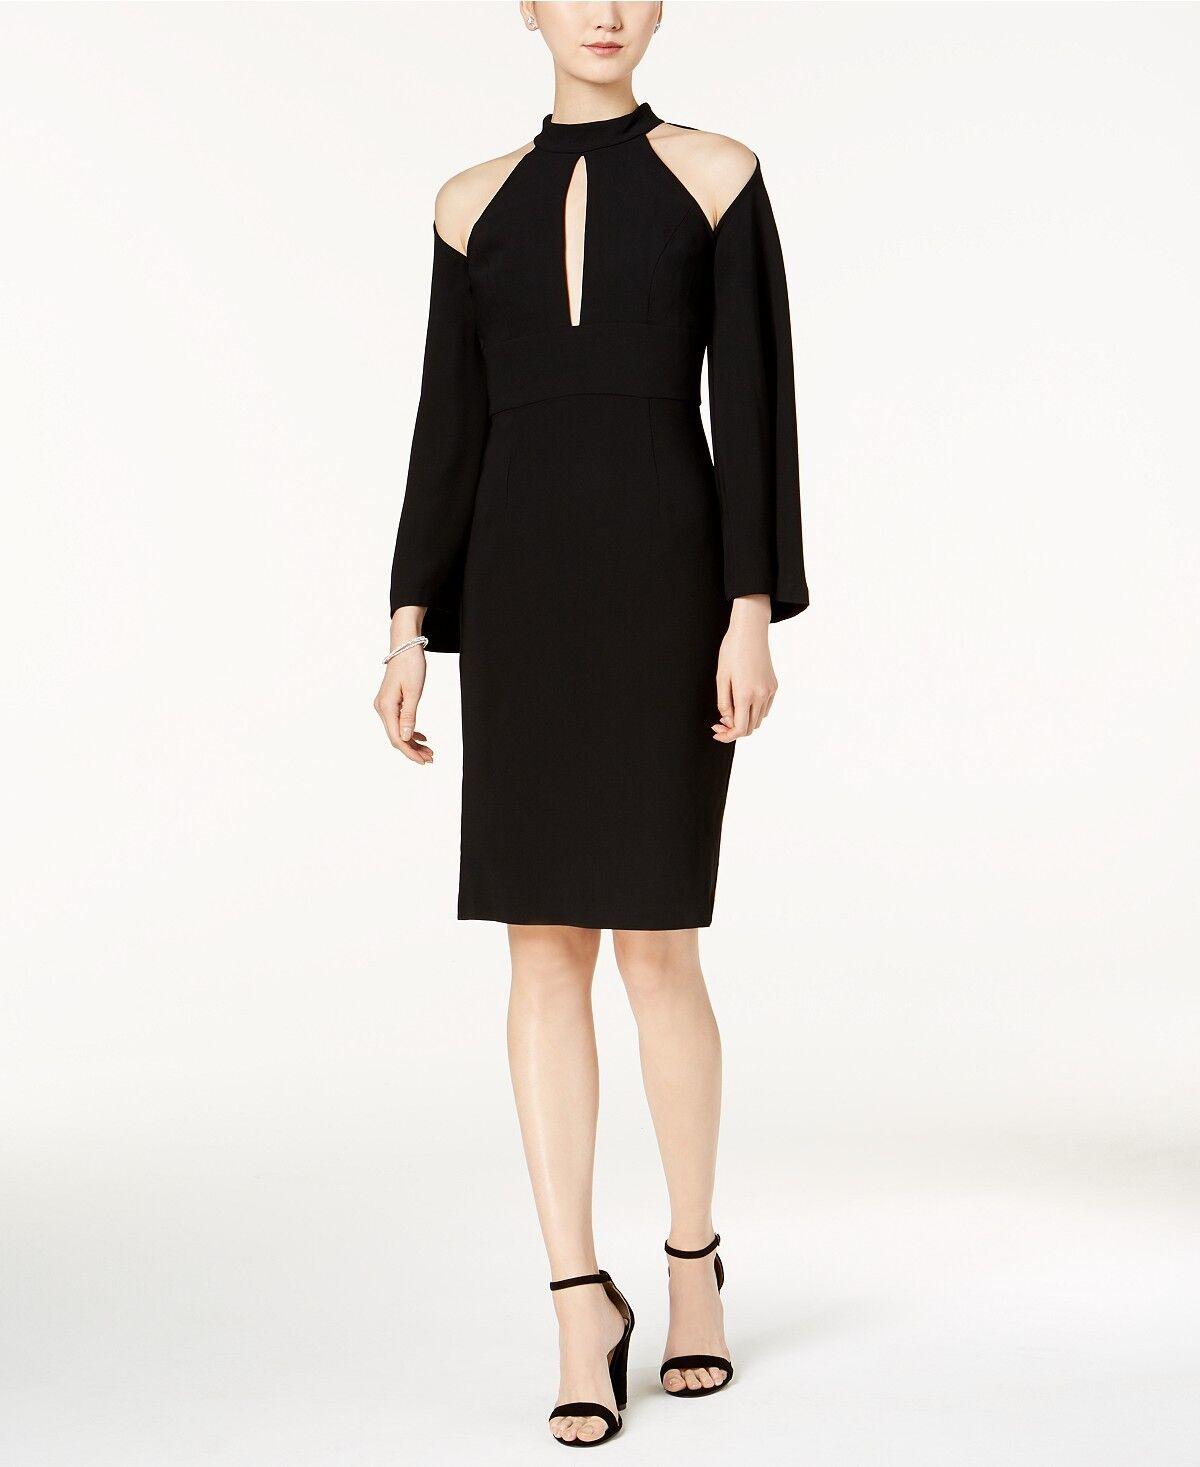 New Bardot Mock-Neck Cold-Shoulder Sheath Dress S schwarz